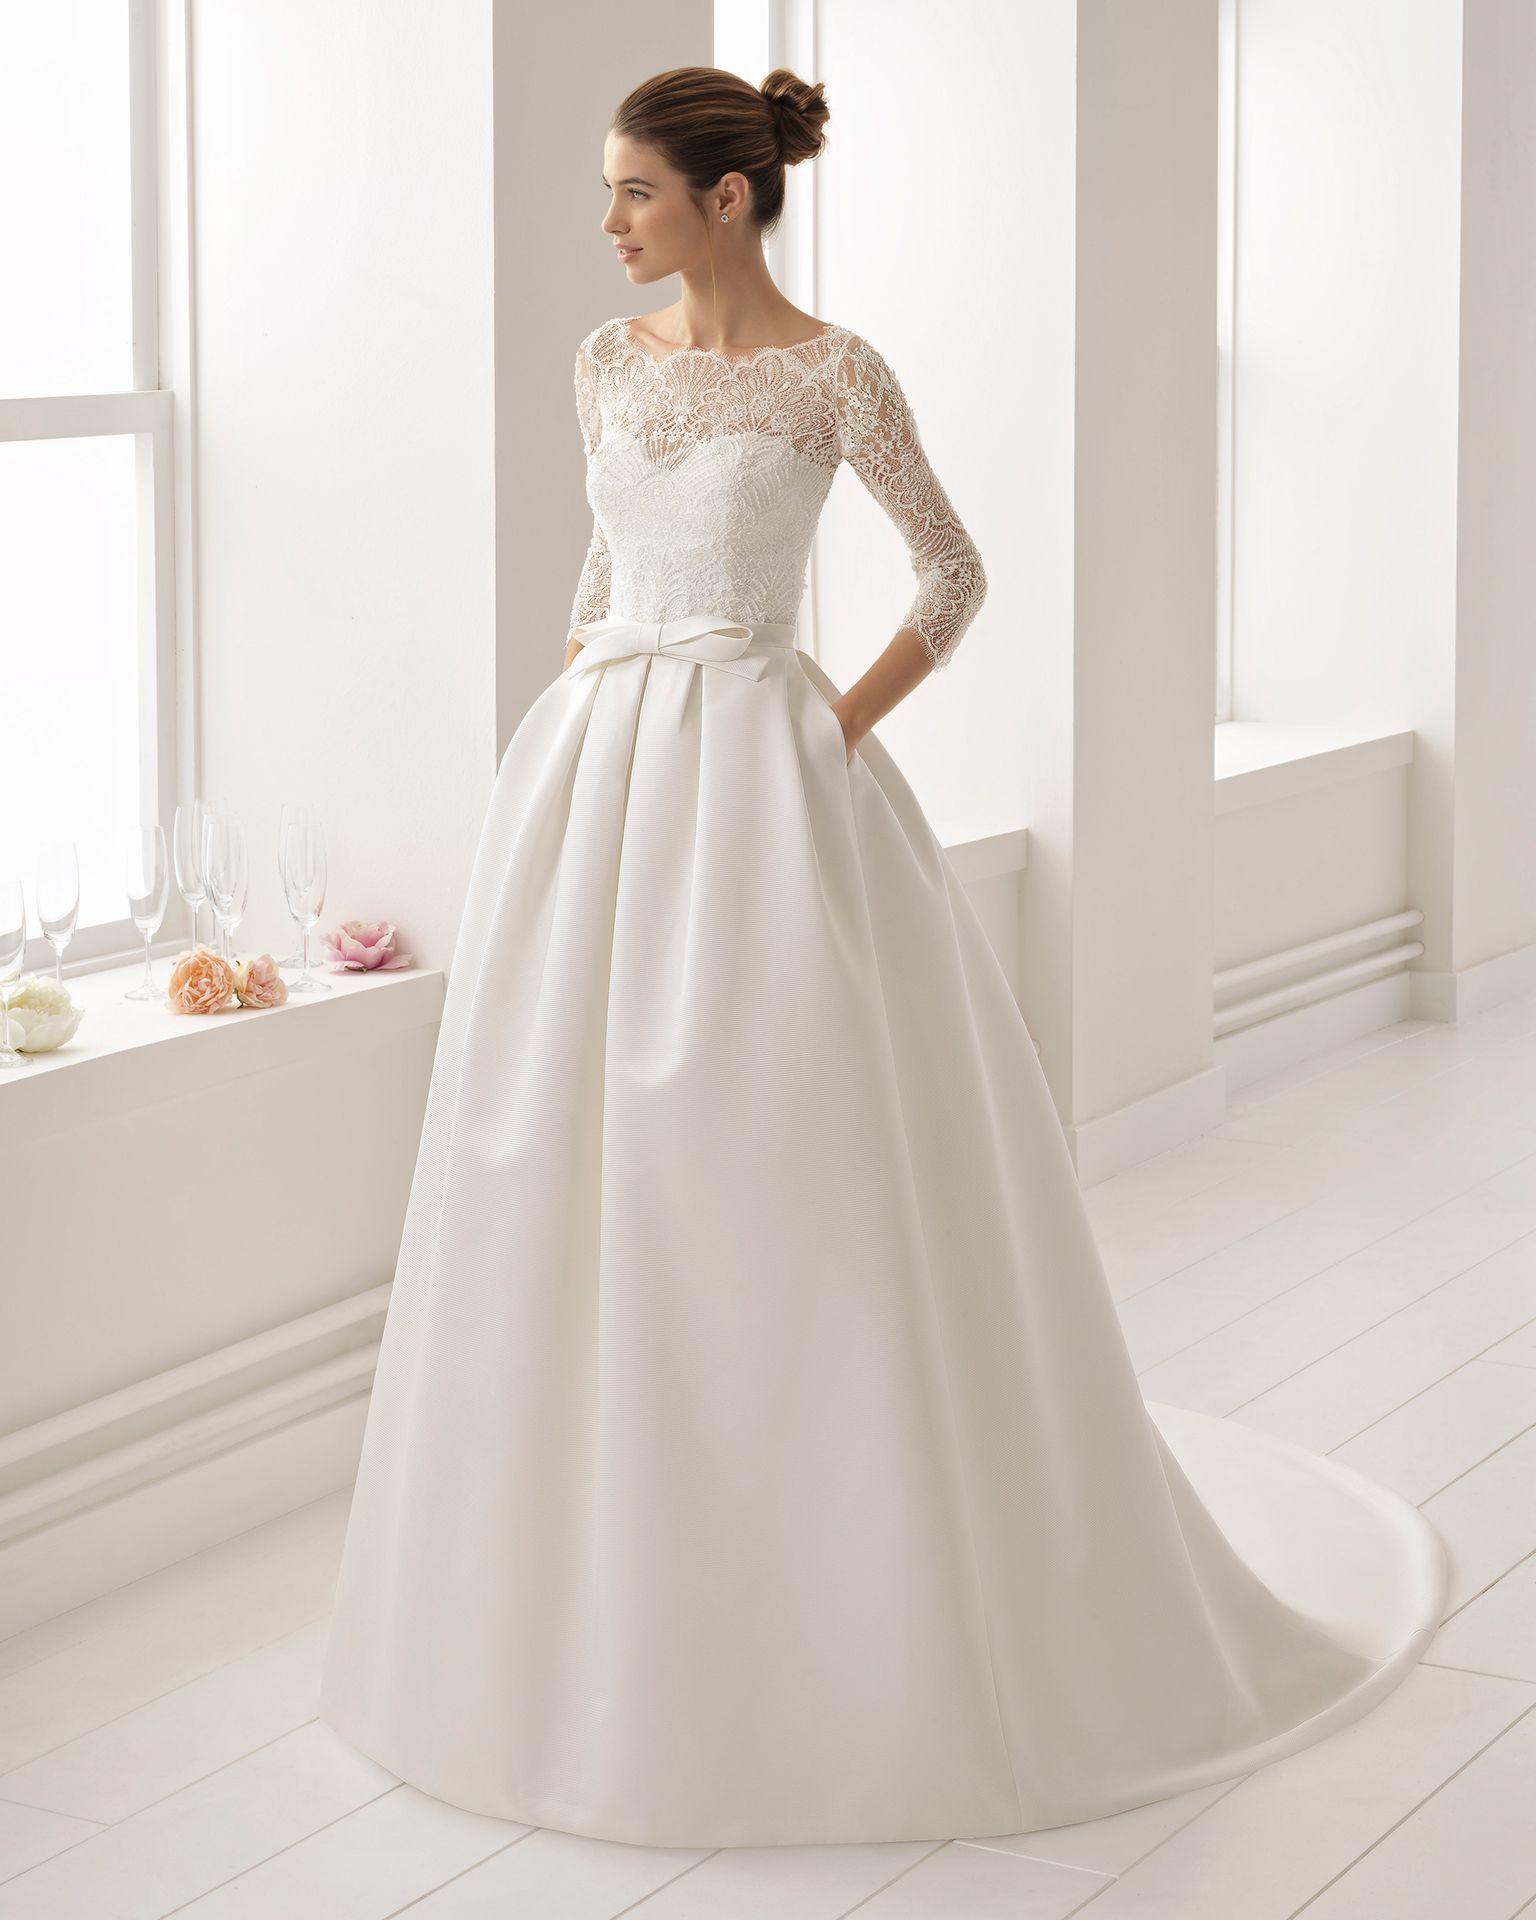 2146932ac Vestido de novia estilo clásico en otoman